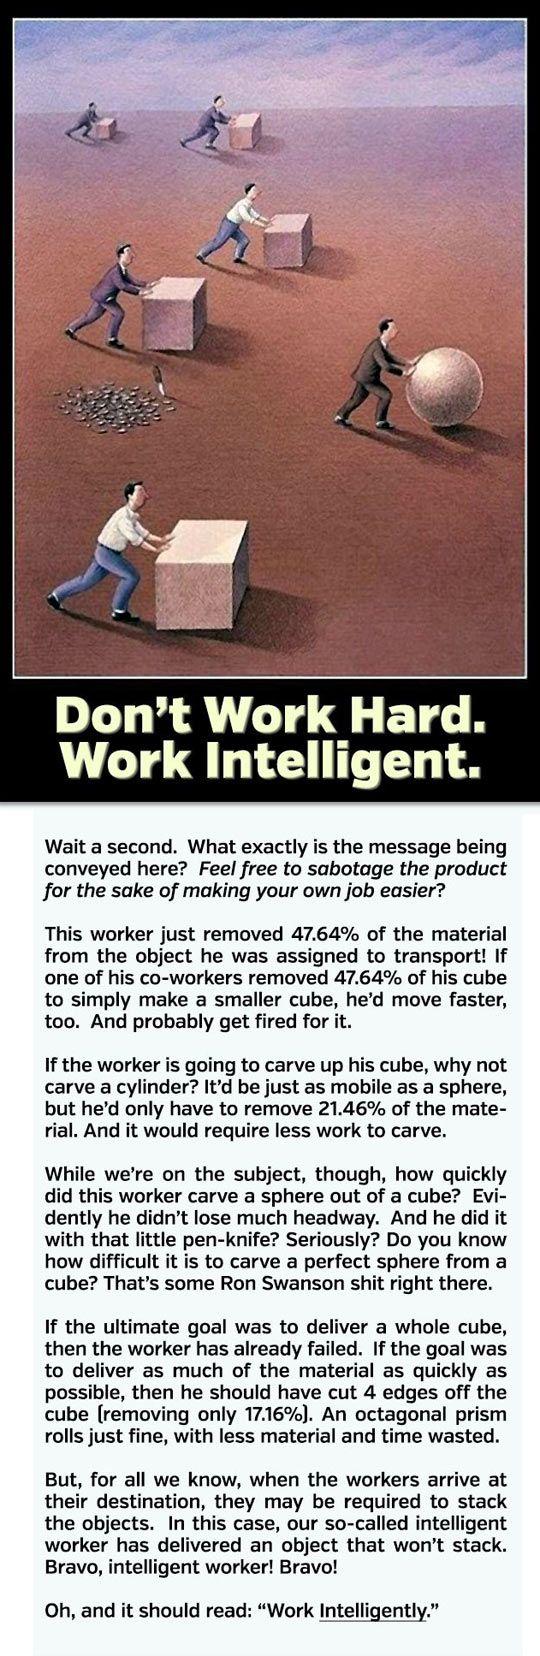 Work Intelligently